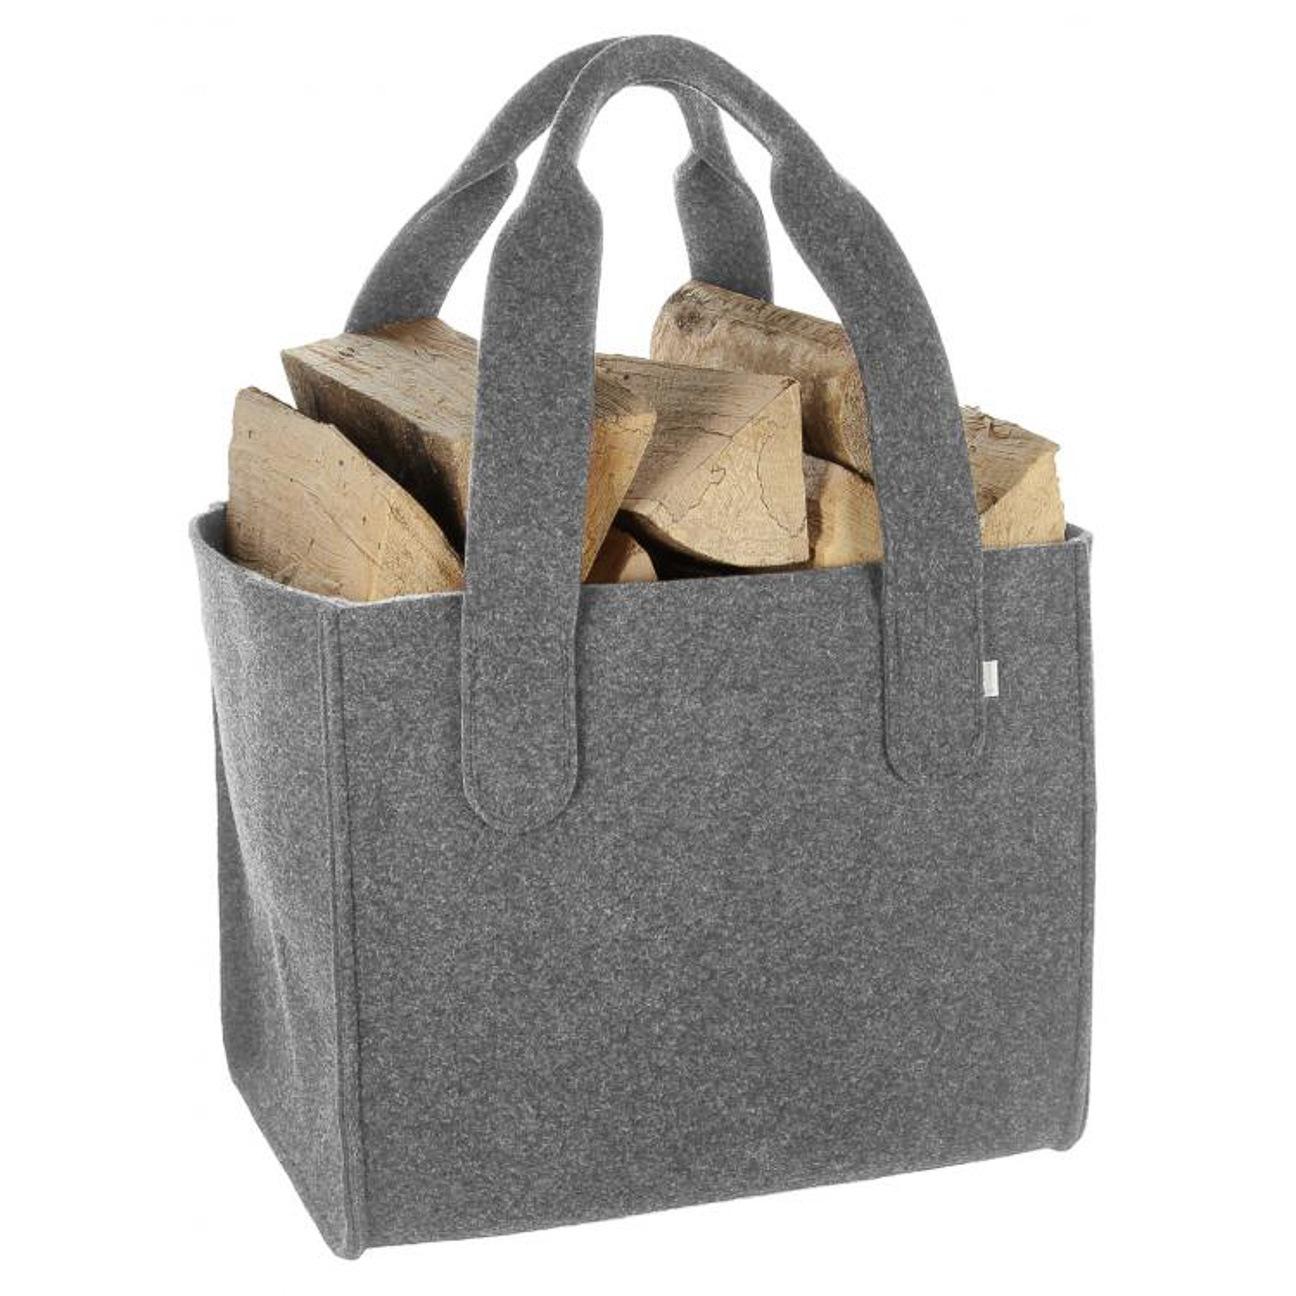 Felt Ipad Bag Laptop Bags